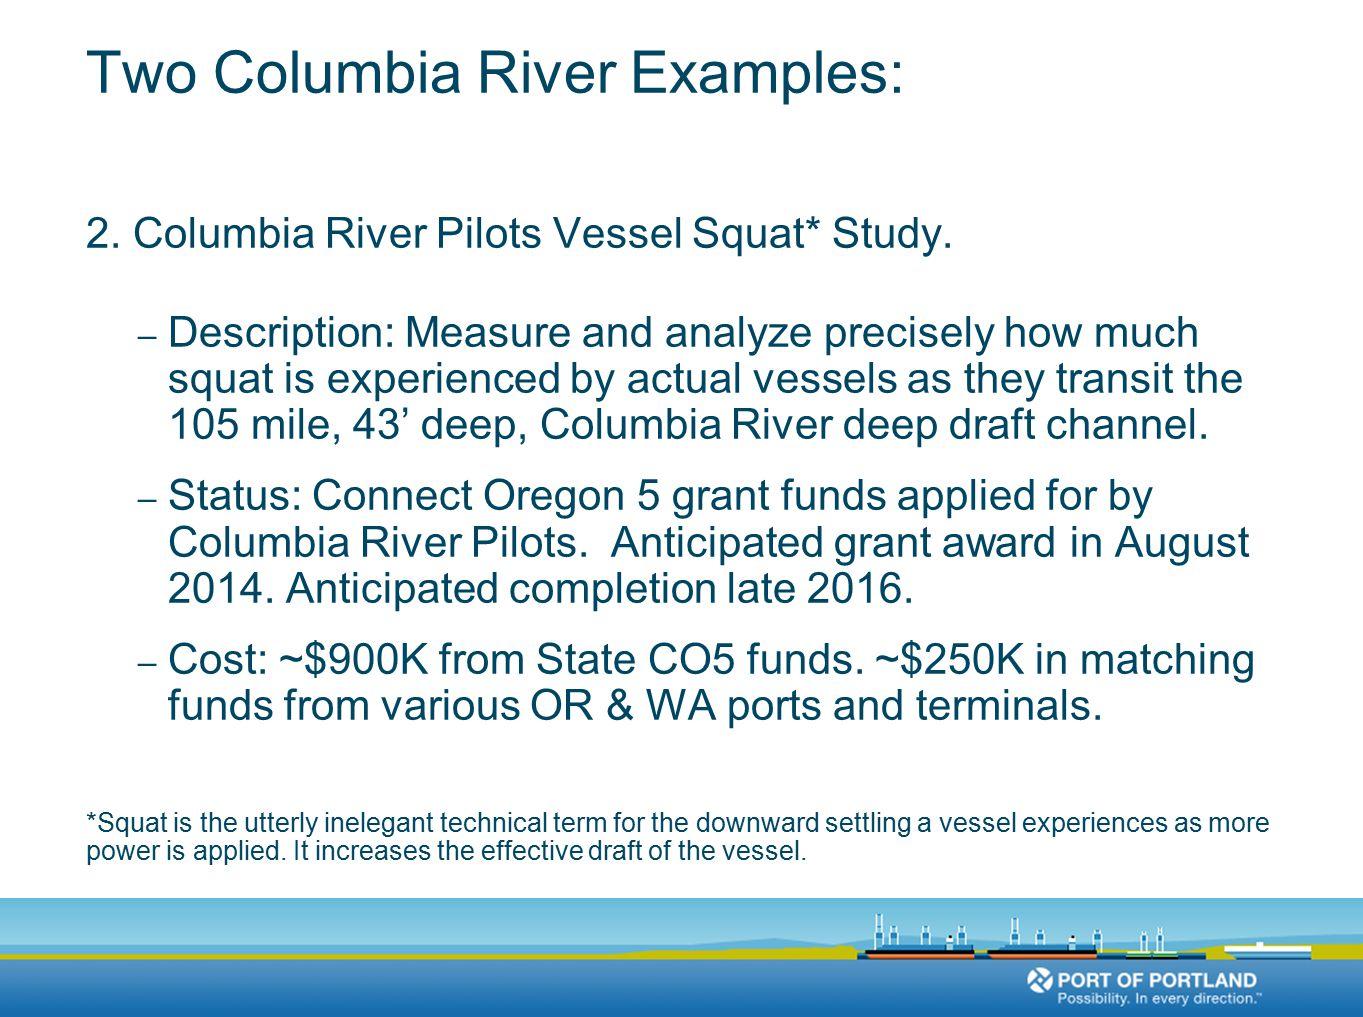 Two Columbia River Examples: 2. Columbia River Pilots Vessel Squat* Study.